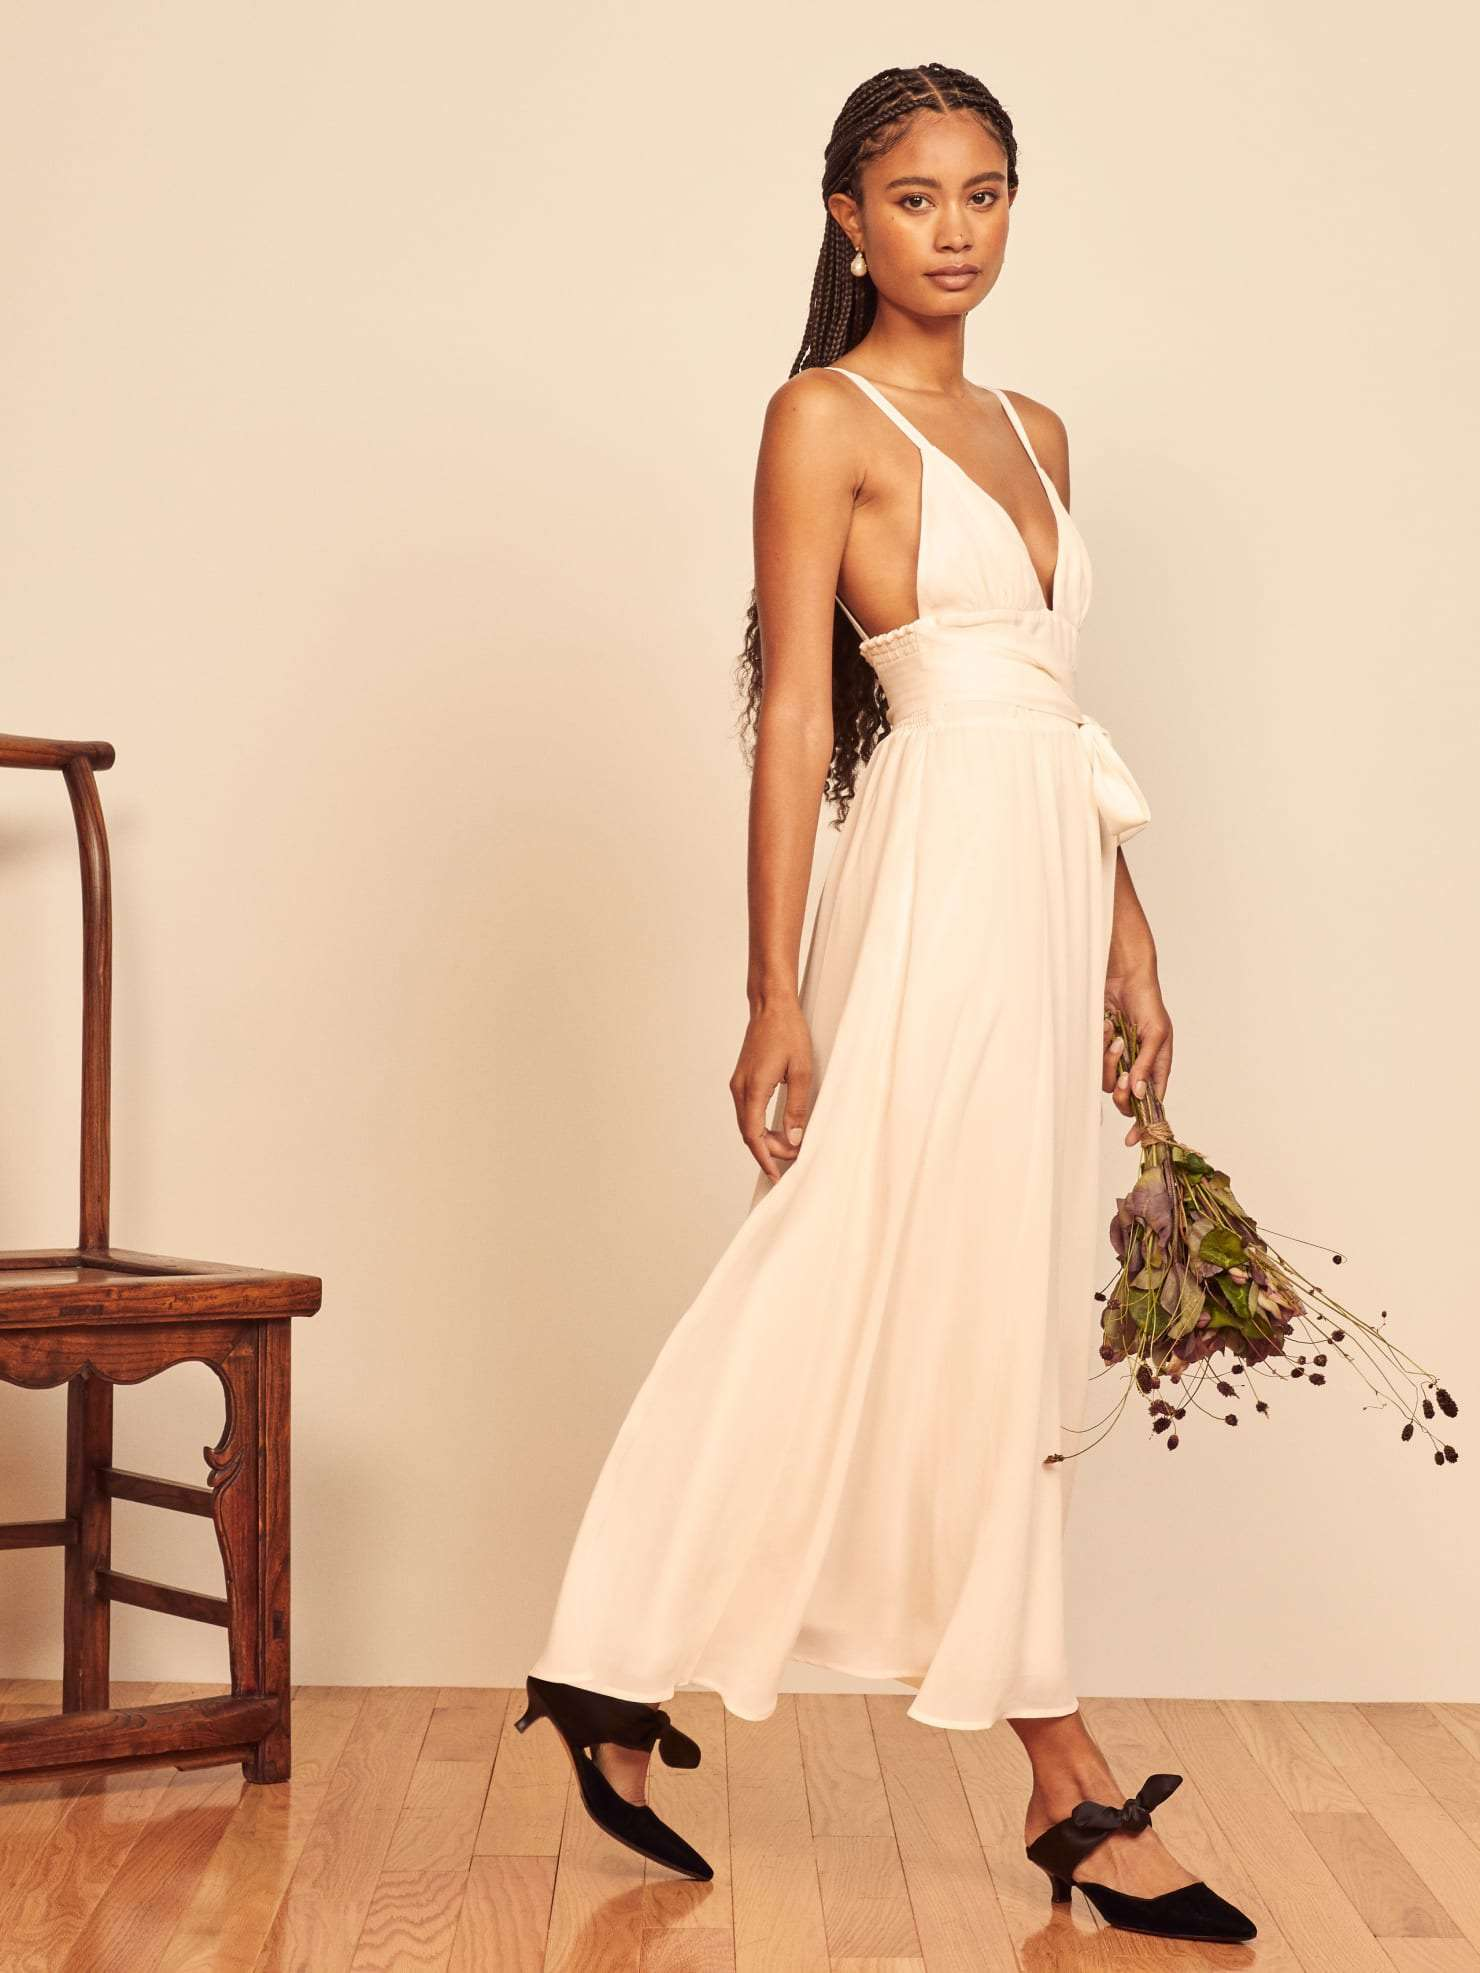 Reformation Prosecco dress for beach wedding